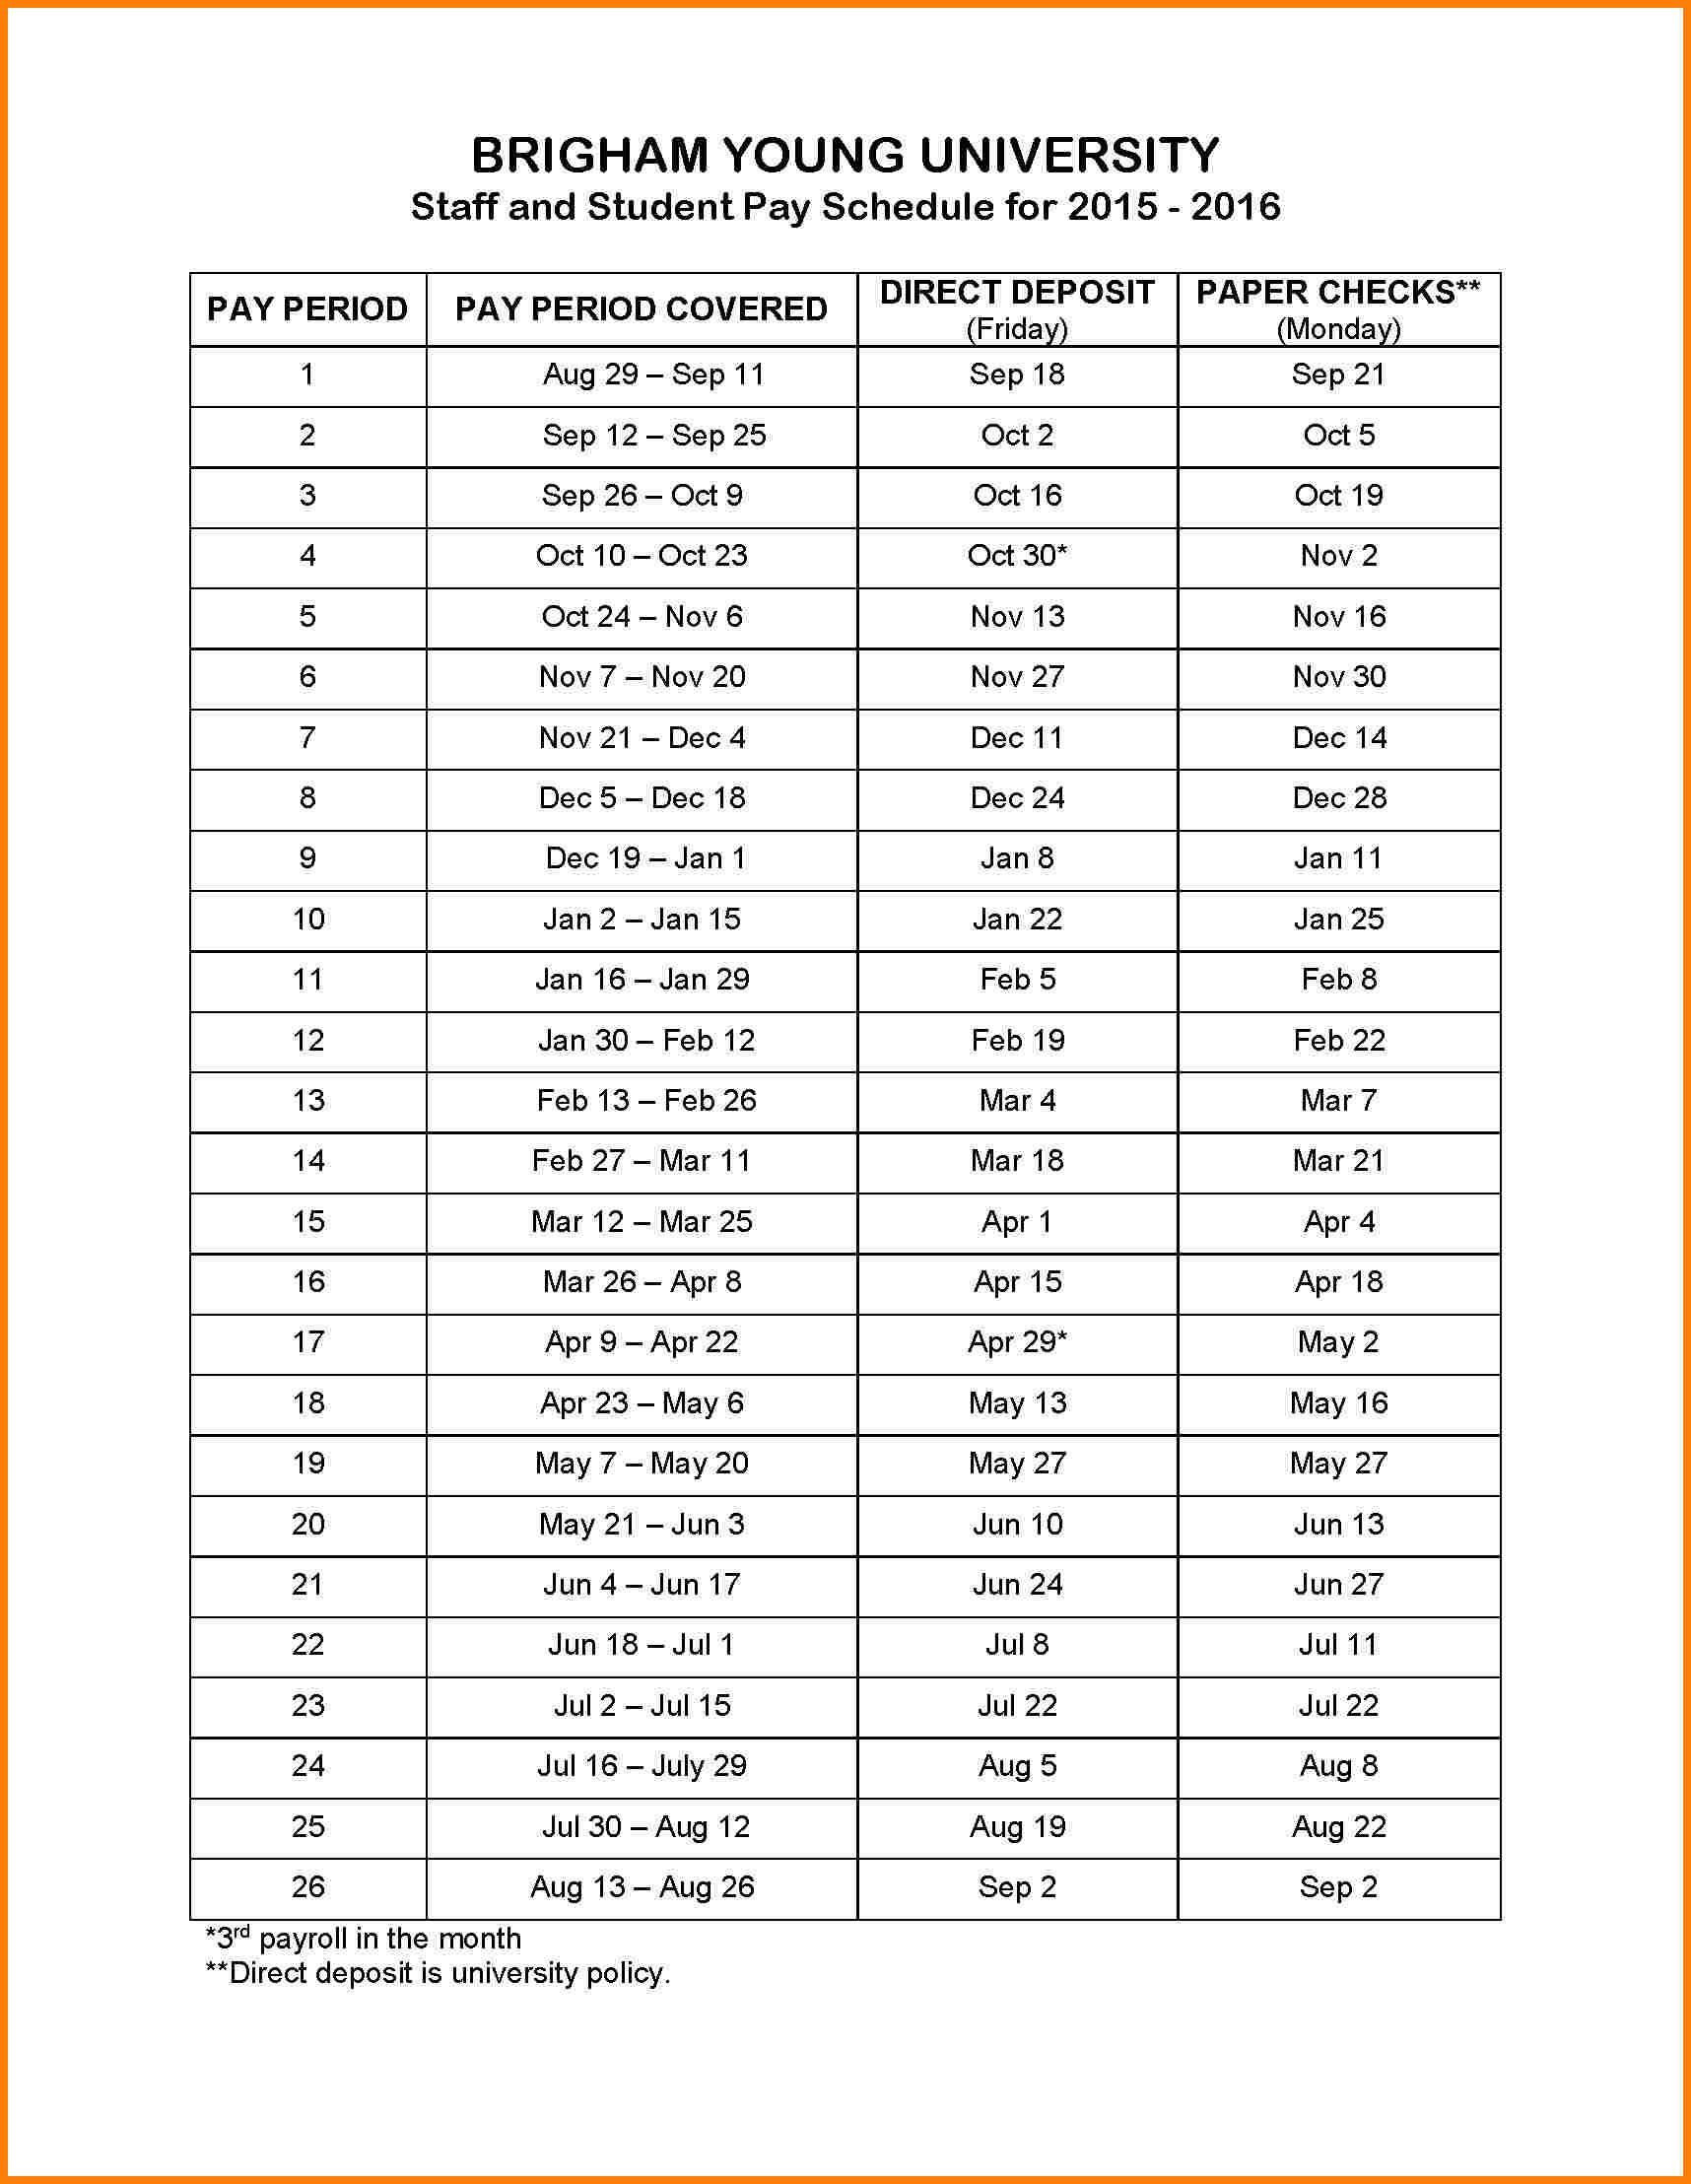 004 Template Ideas Biweekly Payroll Calendar Pay Schedule In